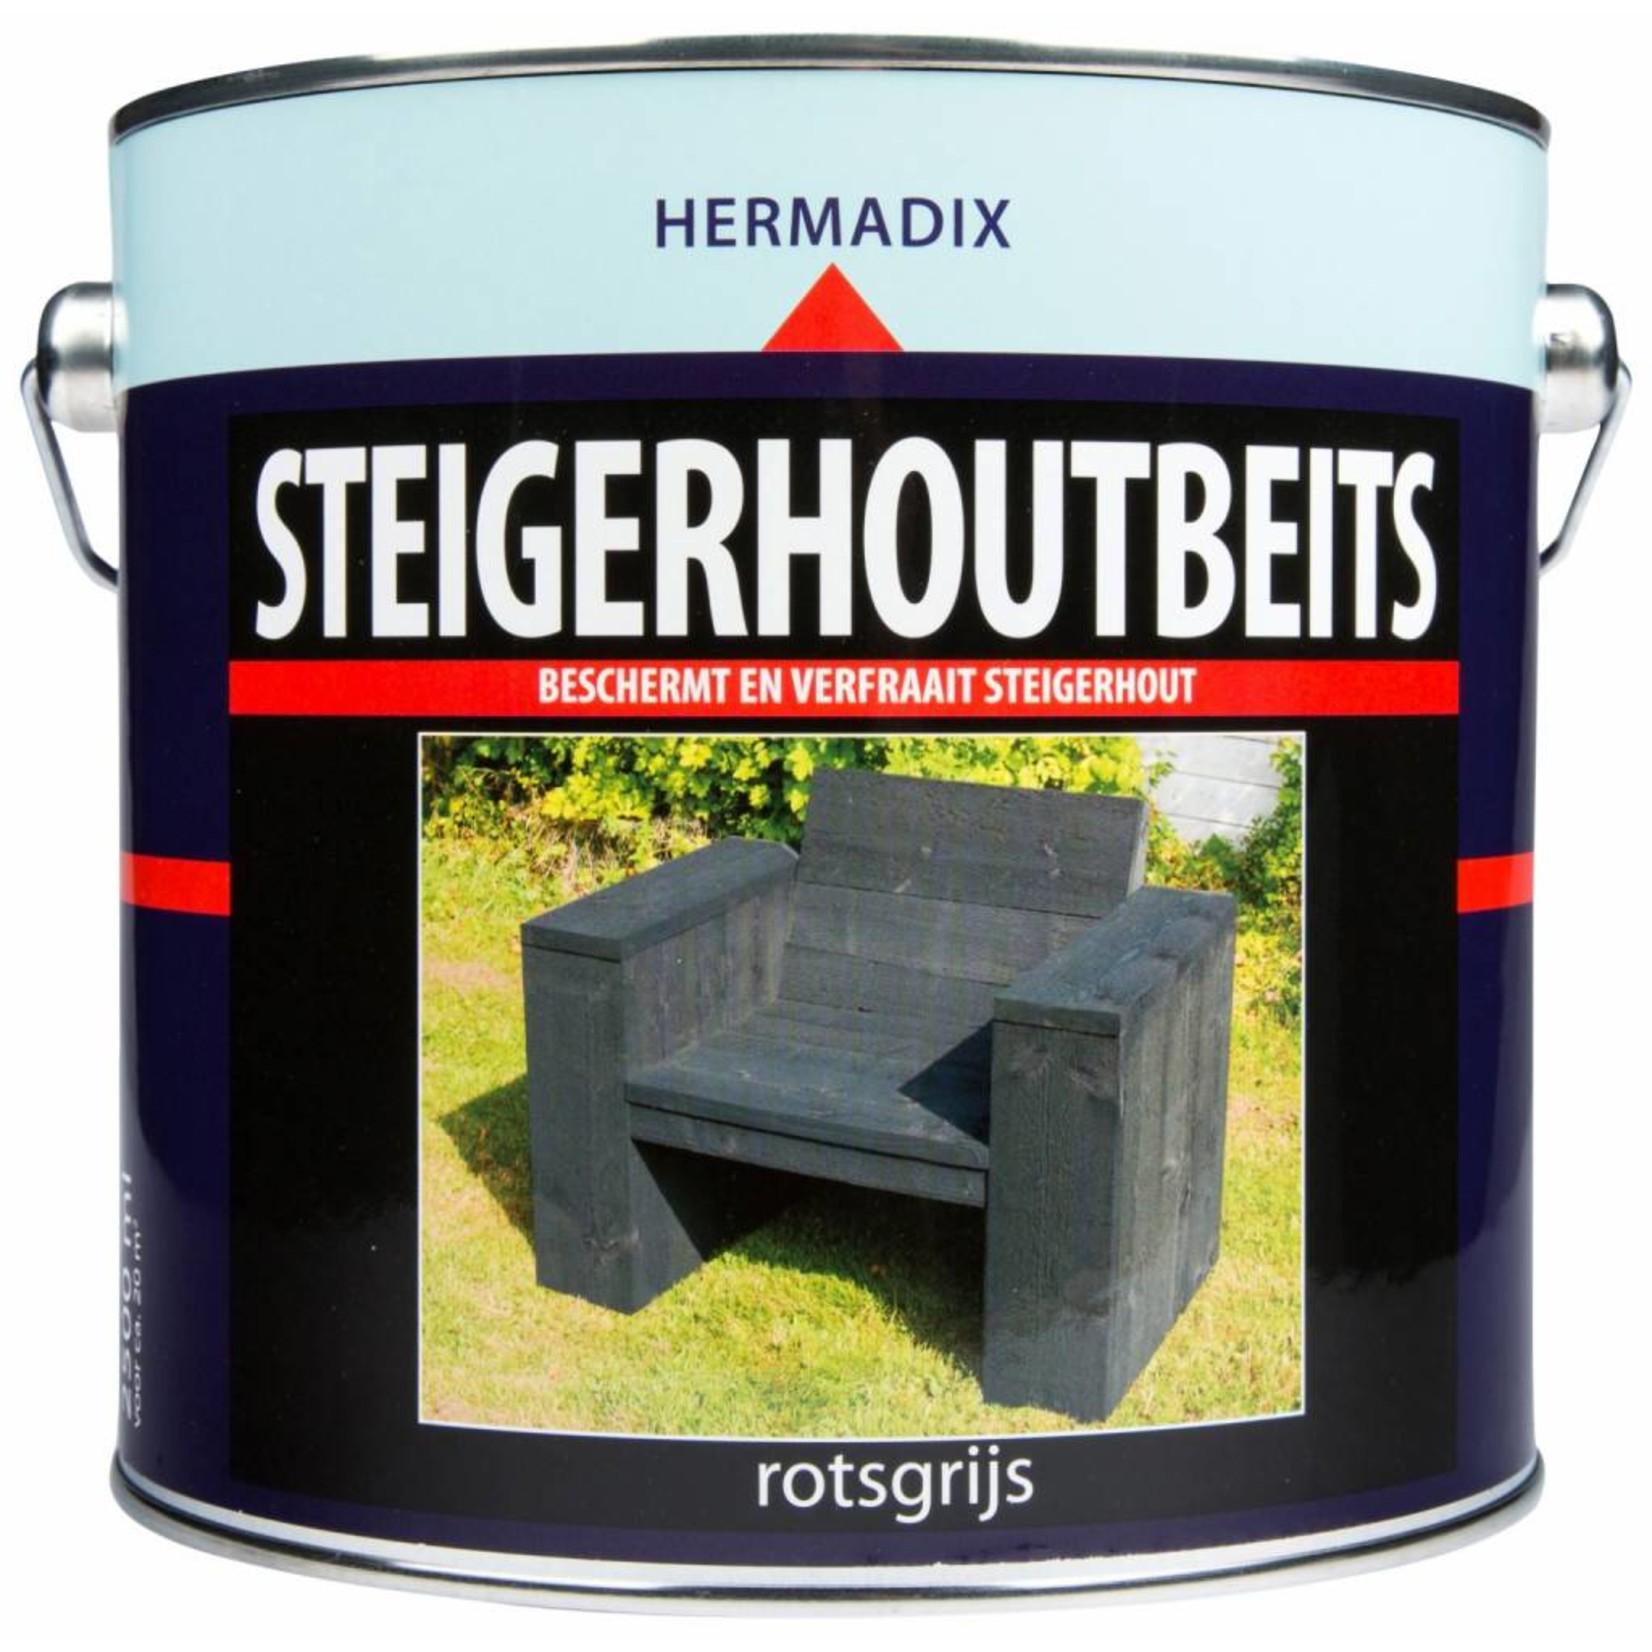 STB Rotsgrijs